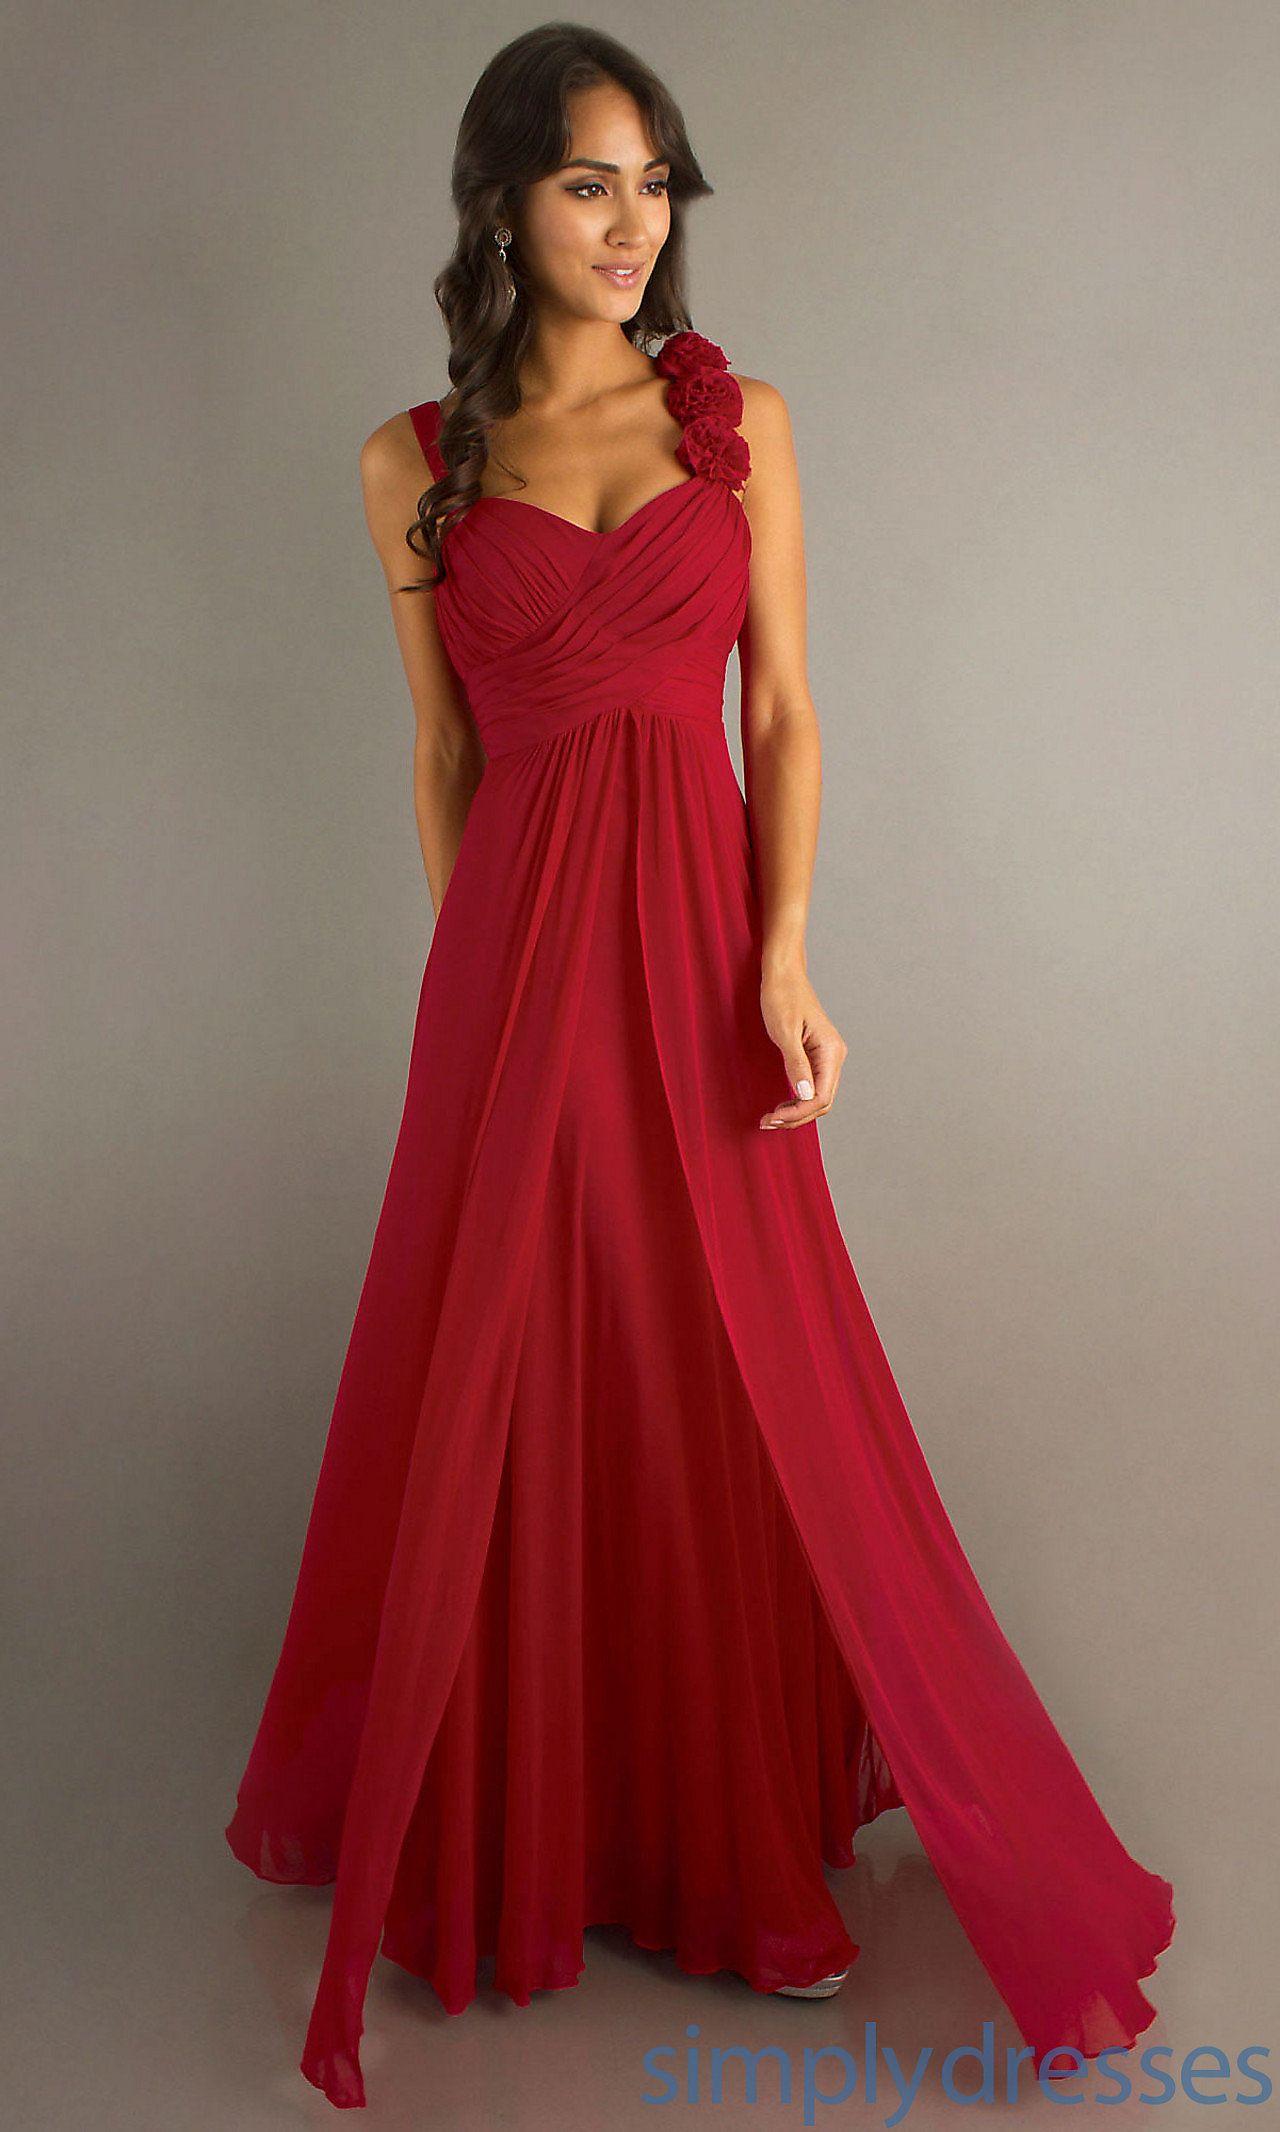 Cheap long formal prom dress cheap evening gown formal wear